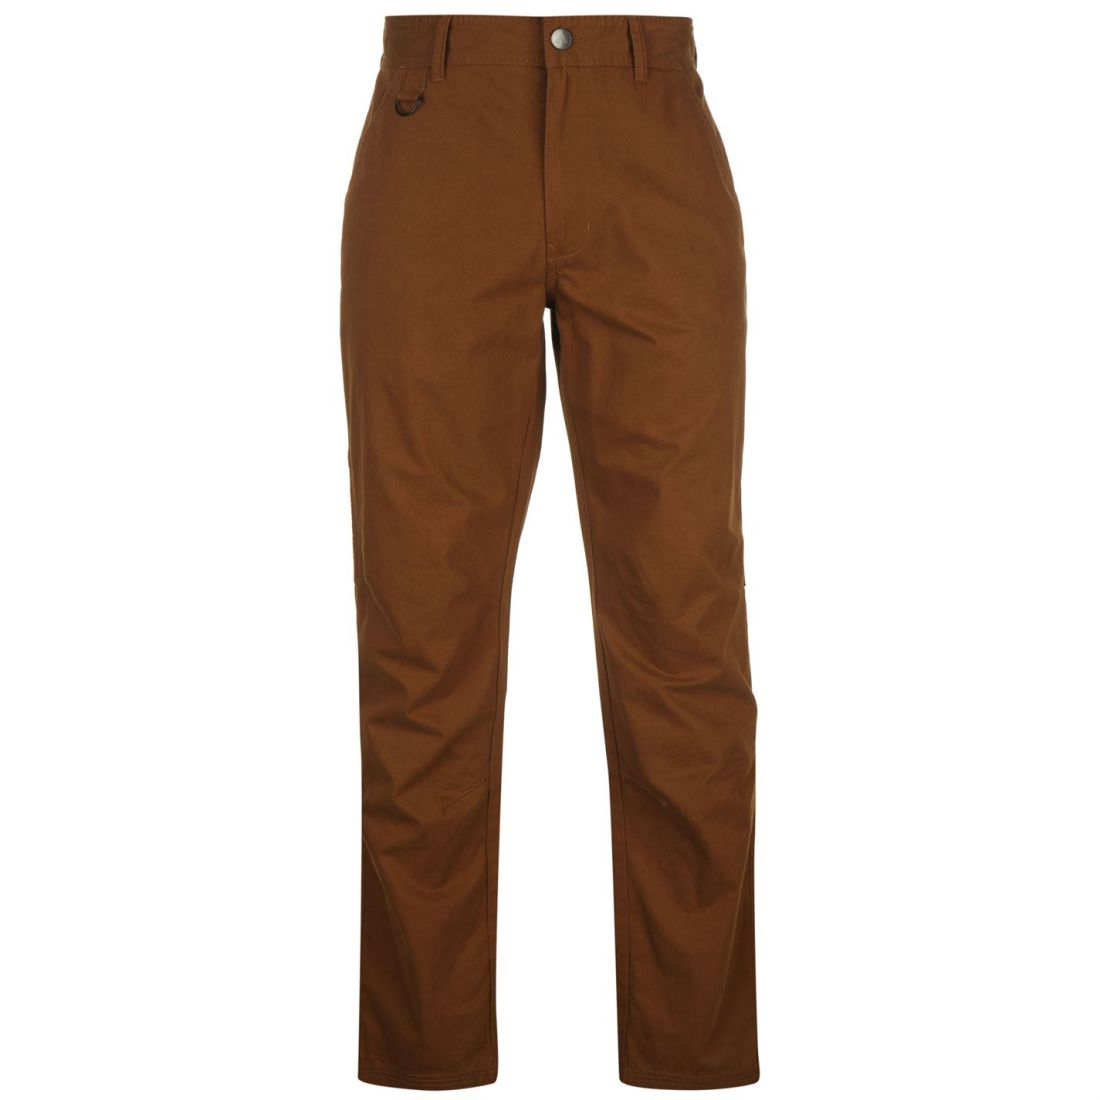 Airwalk Mens Utility Pants Trousers Bottoms Zip Cotton Cargo Style ... 225b6b930dcd